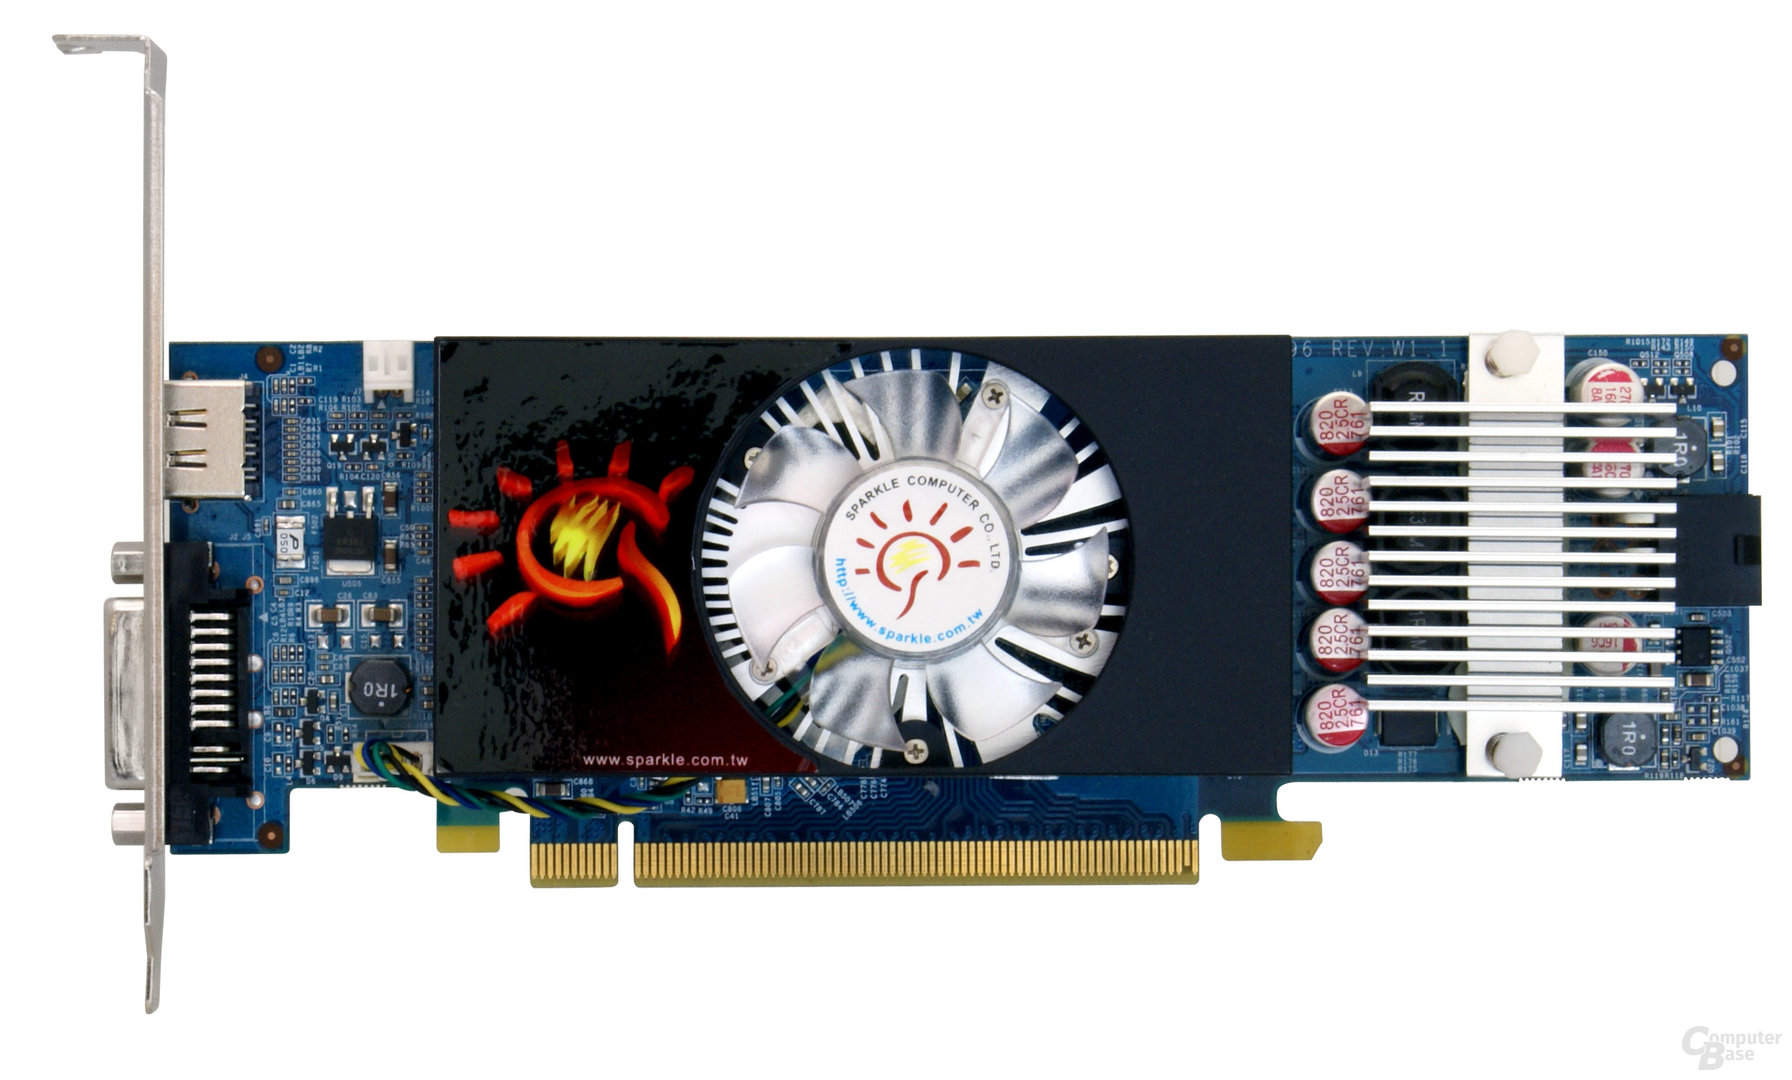 Sparkle GeForce GTS 250 Low Profile